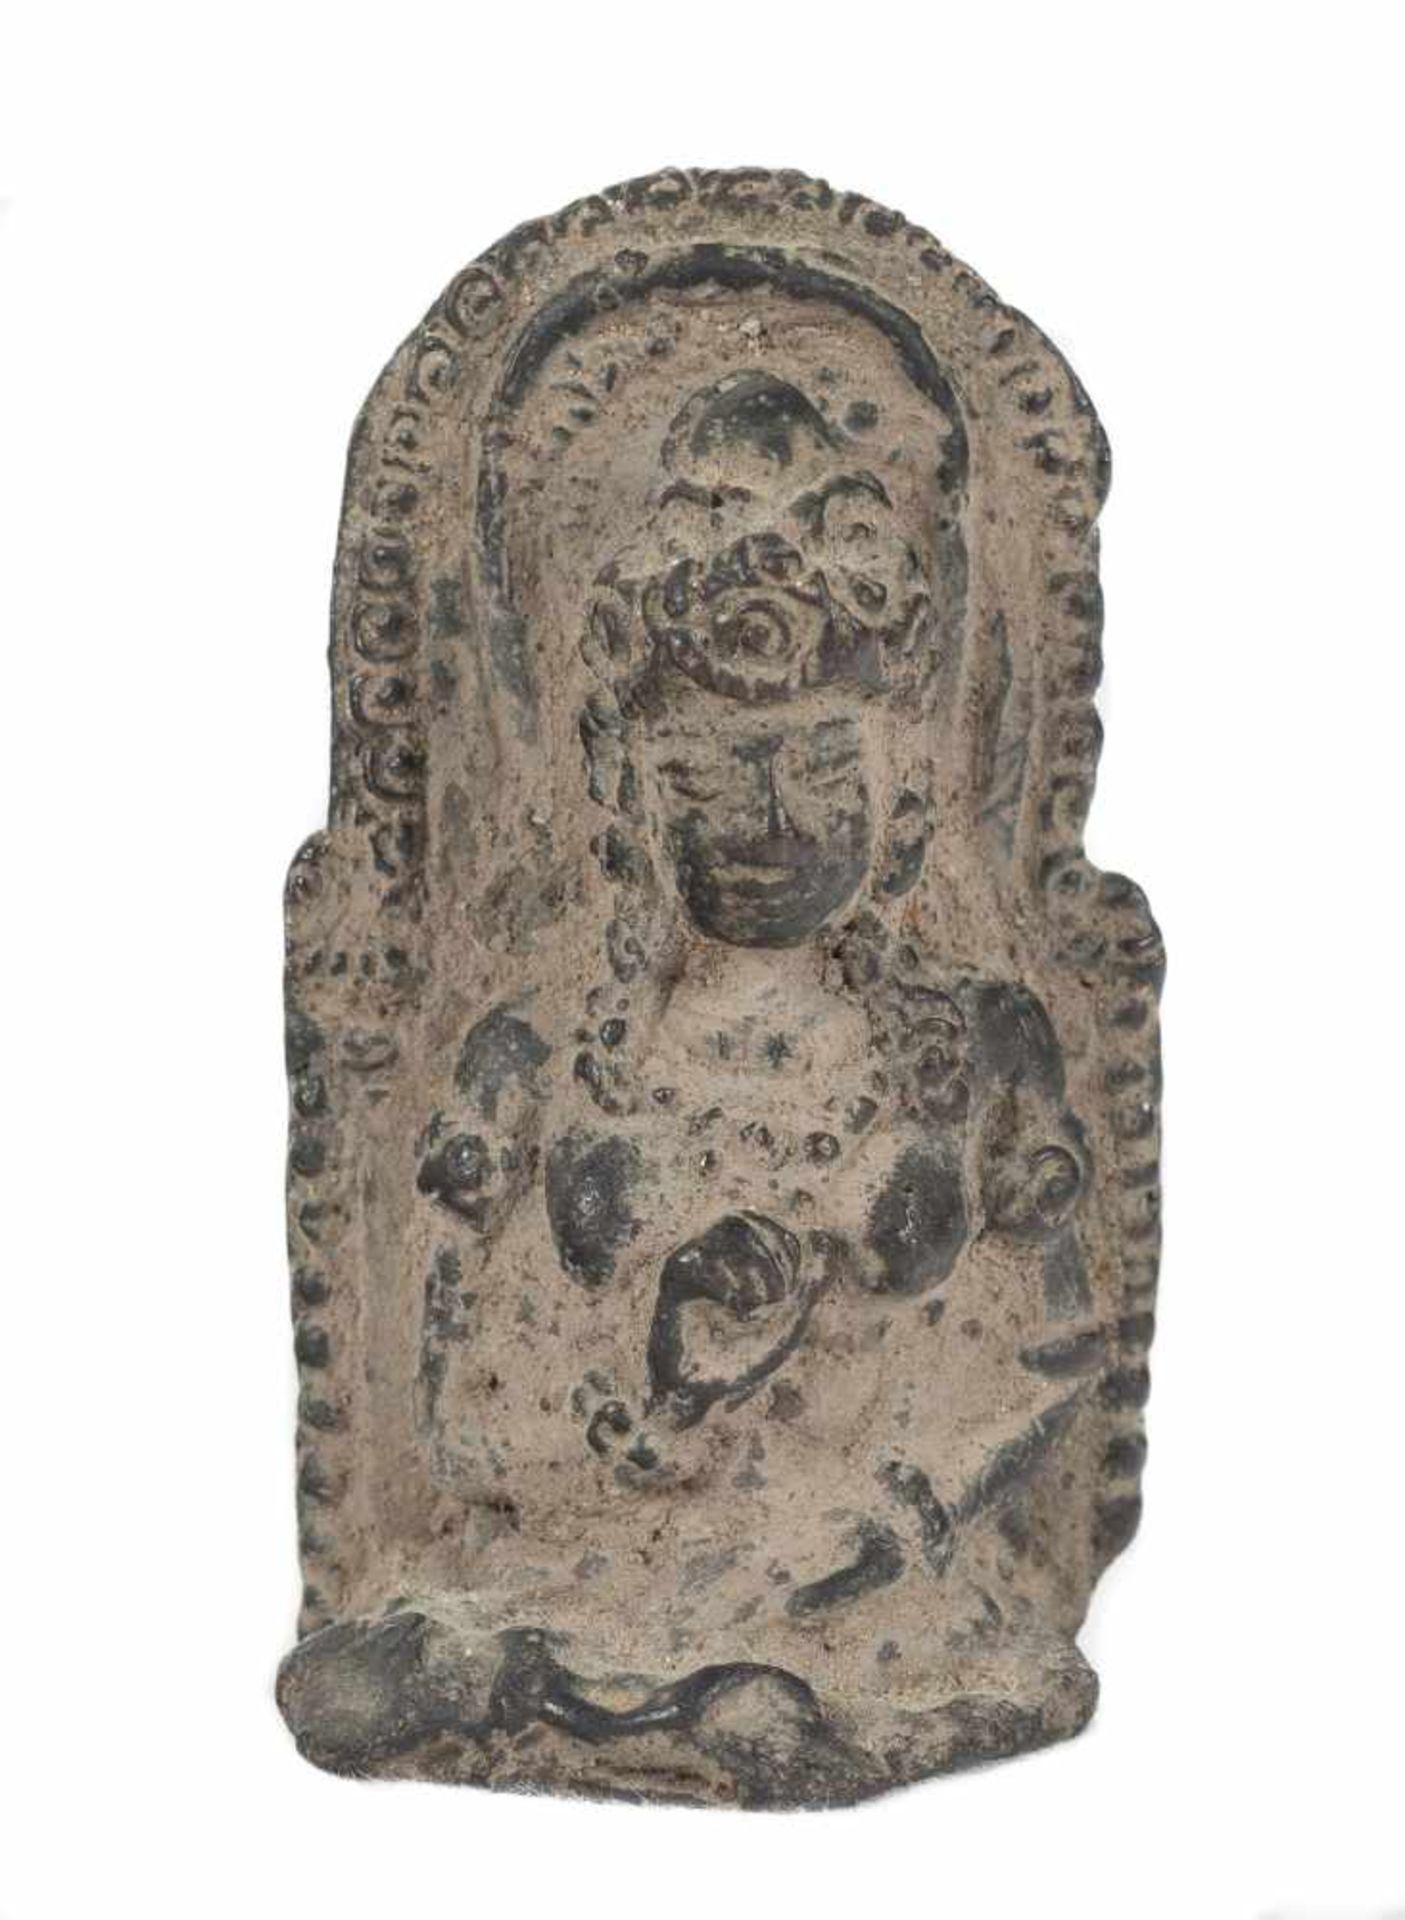 A Singhasari style bronze figure of seated Prajñāpāramitā Buddha, Java. 15th century.6,5 x 3,5